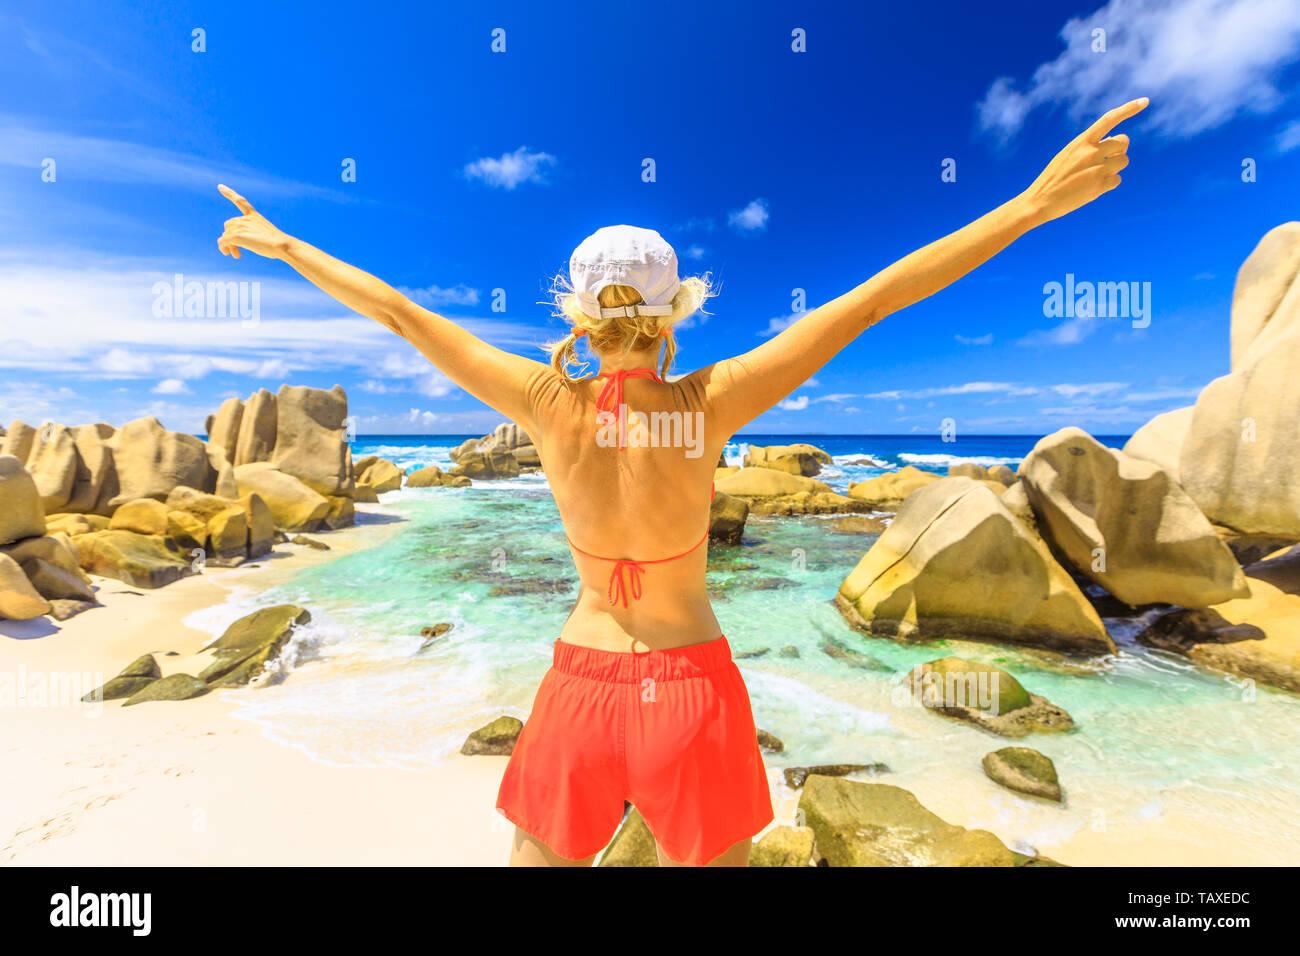 Aerial view of swimming natural pool, La Digue, Anse Marron. Tourist girl in orange bikini with raised arms enjoying on a granite boulder at Anse - Stock Image